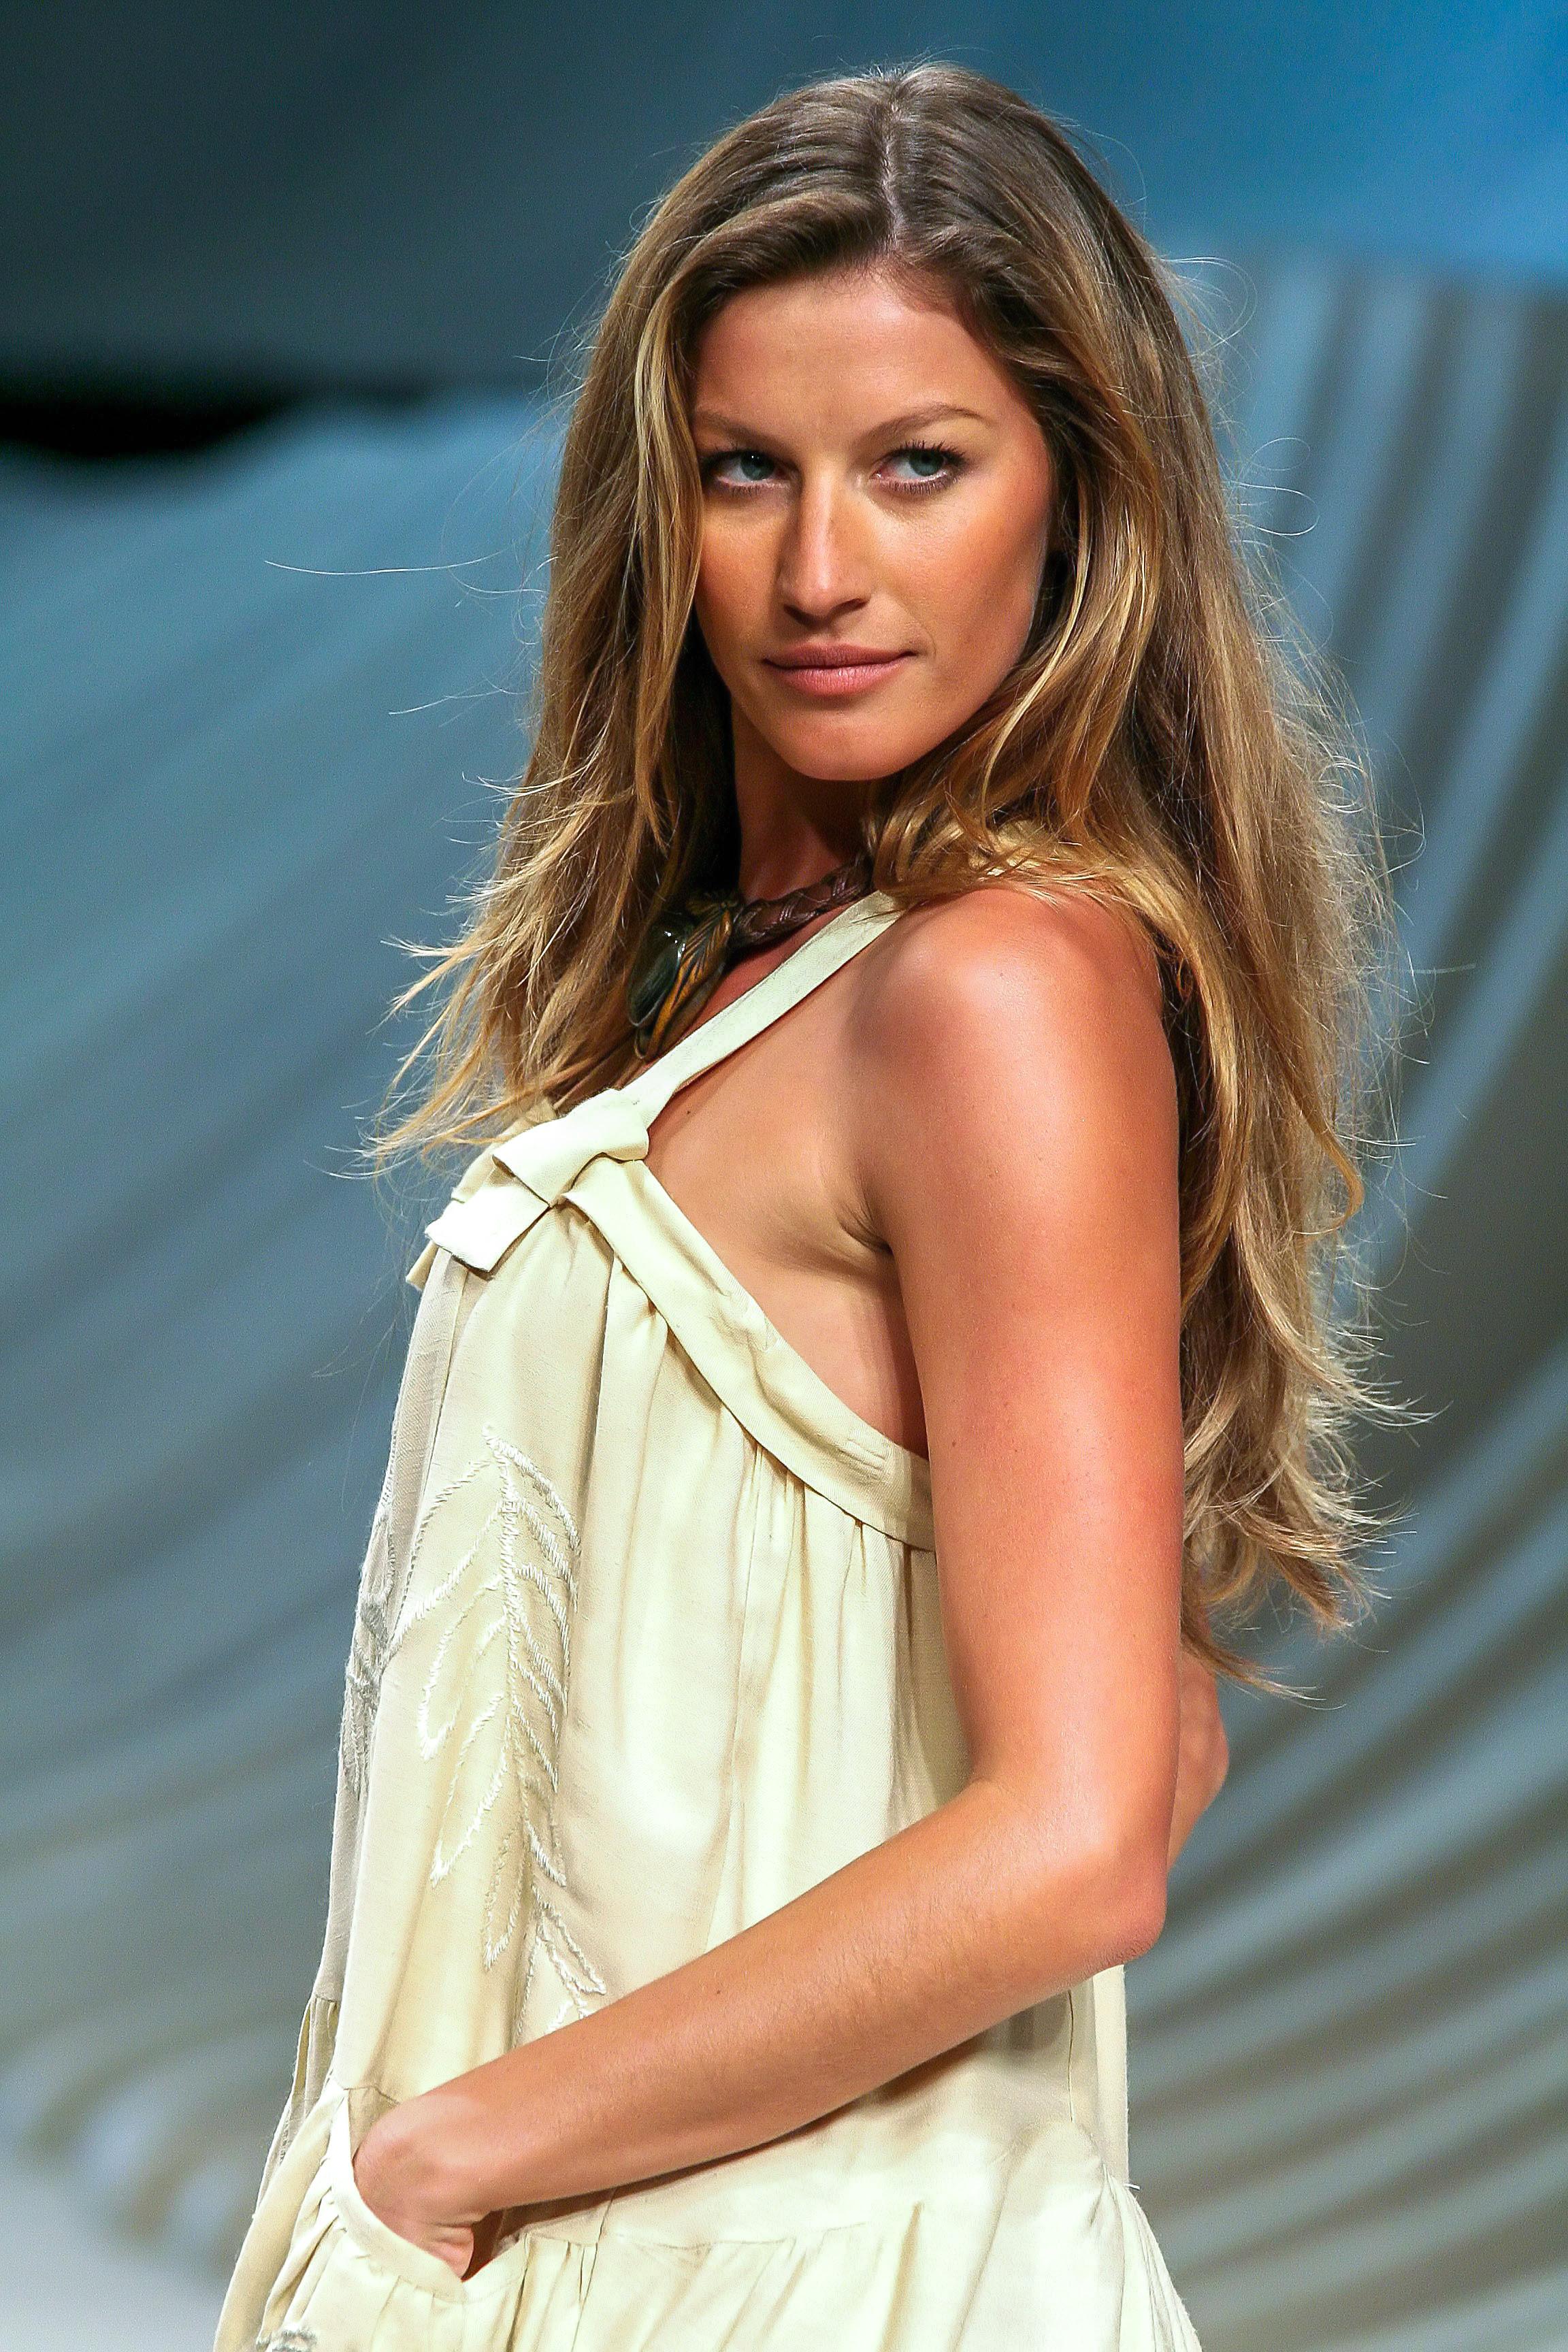 Gisele Bundchen Brazilian Fashion model and film actress very hot and beautiful wallpapers ...